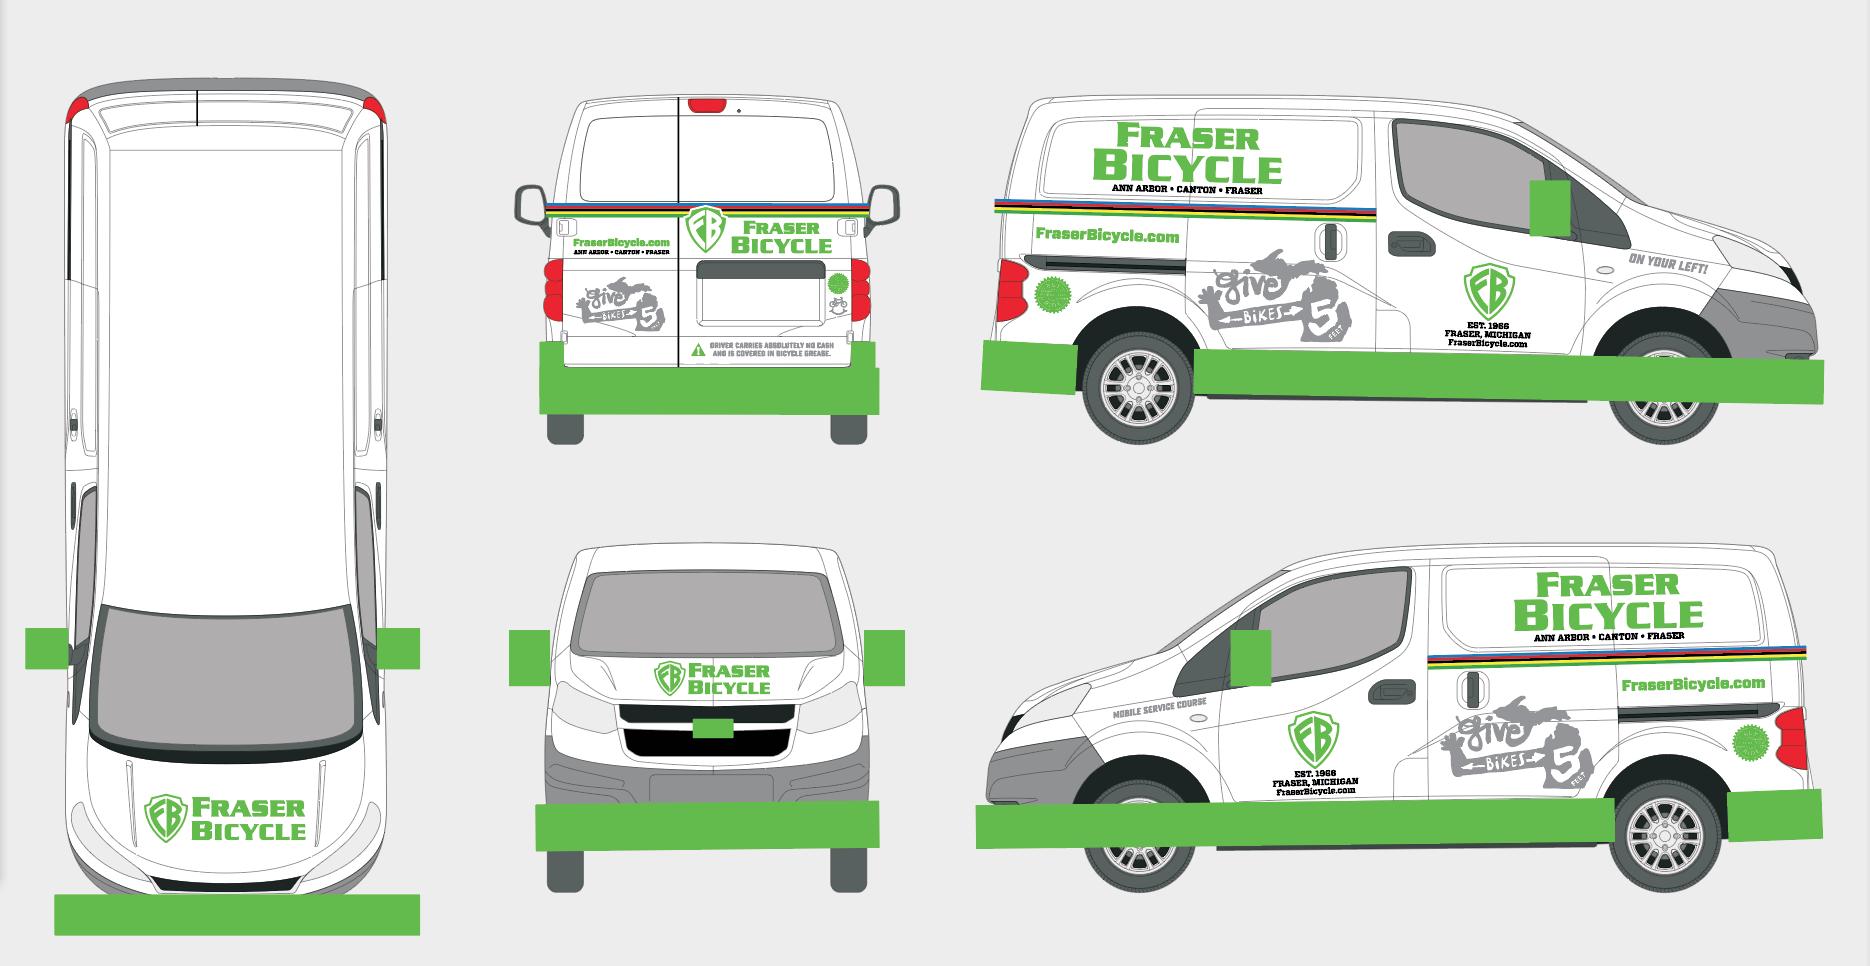 Fraser-Bicycle-Van-Graphics-Design.png